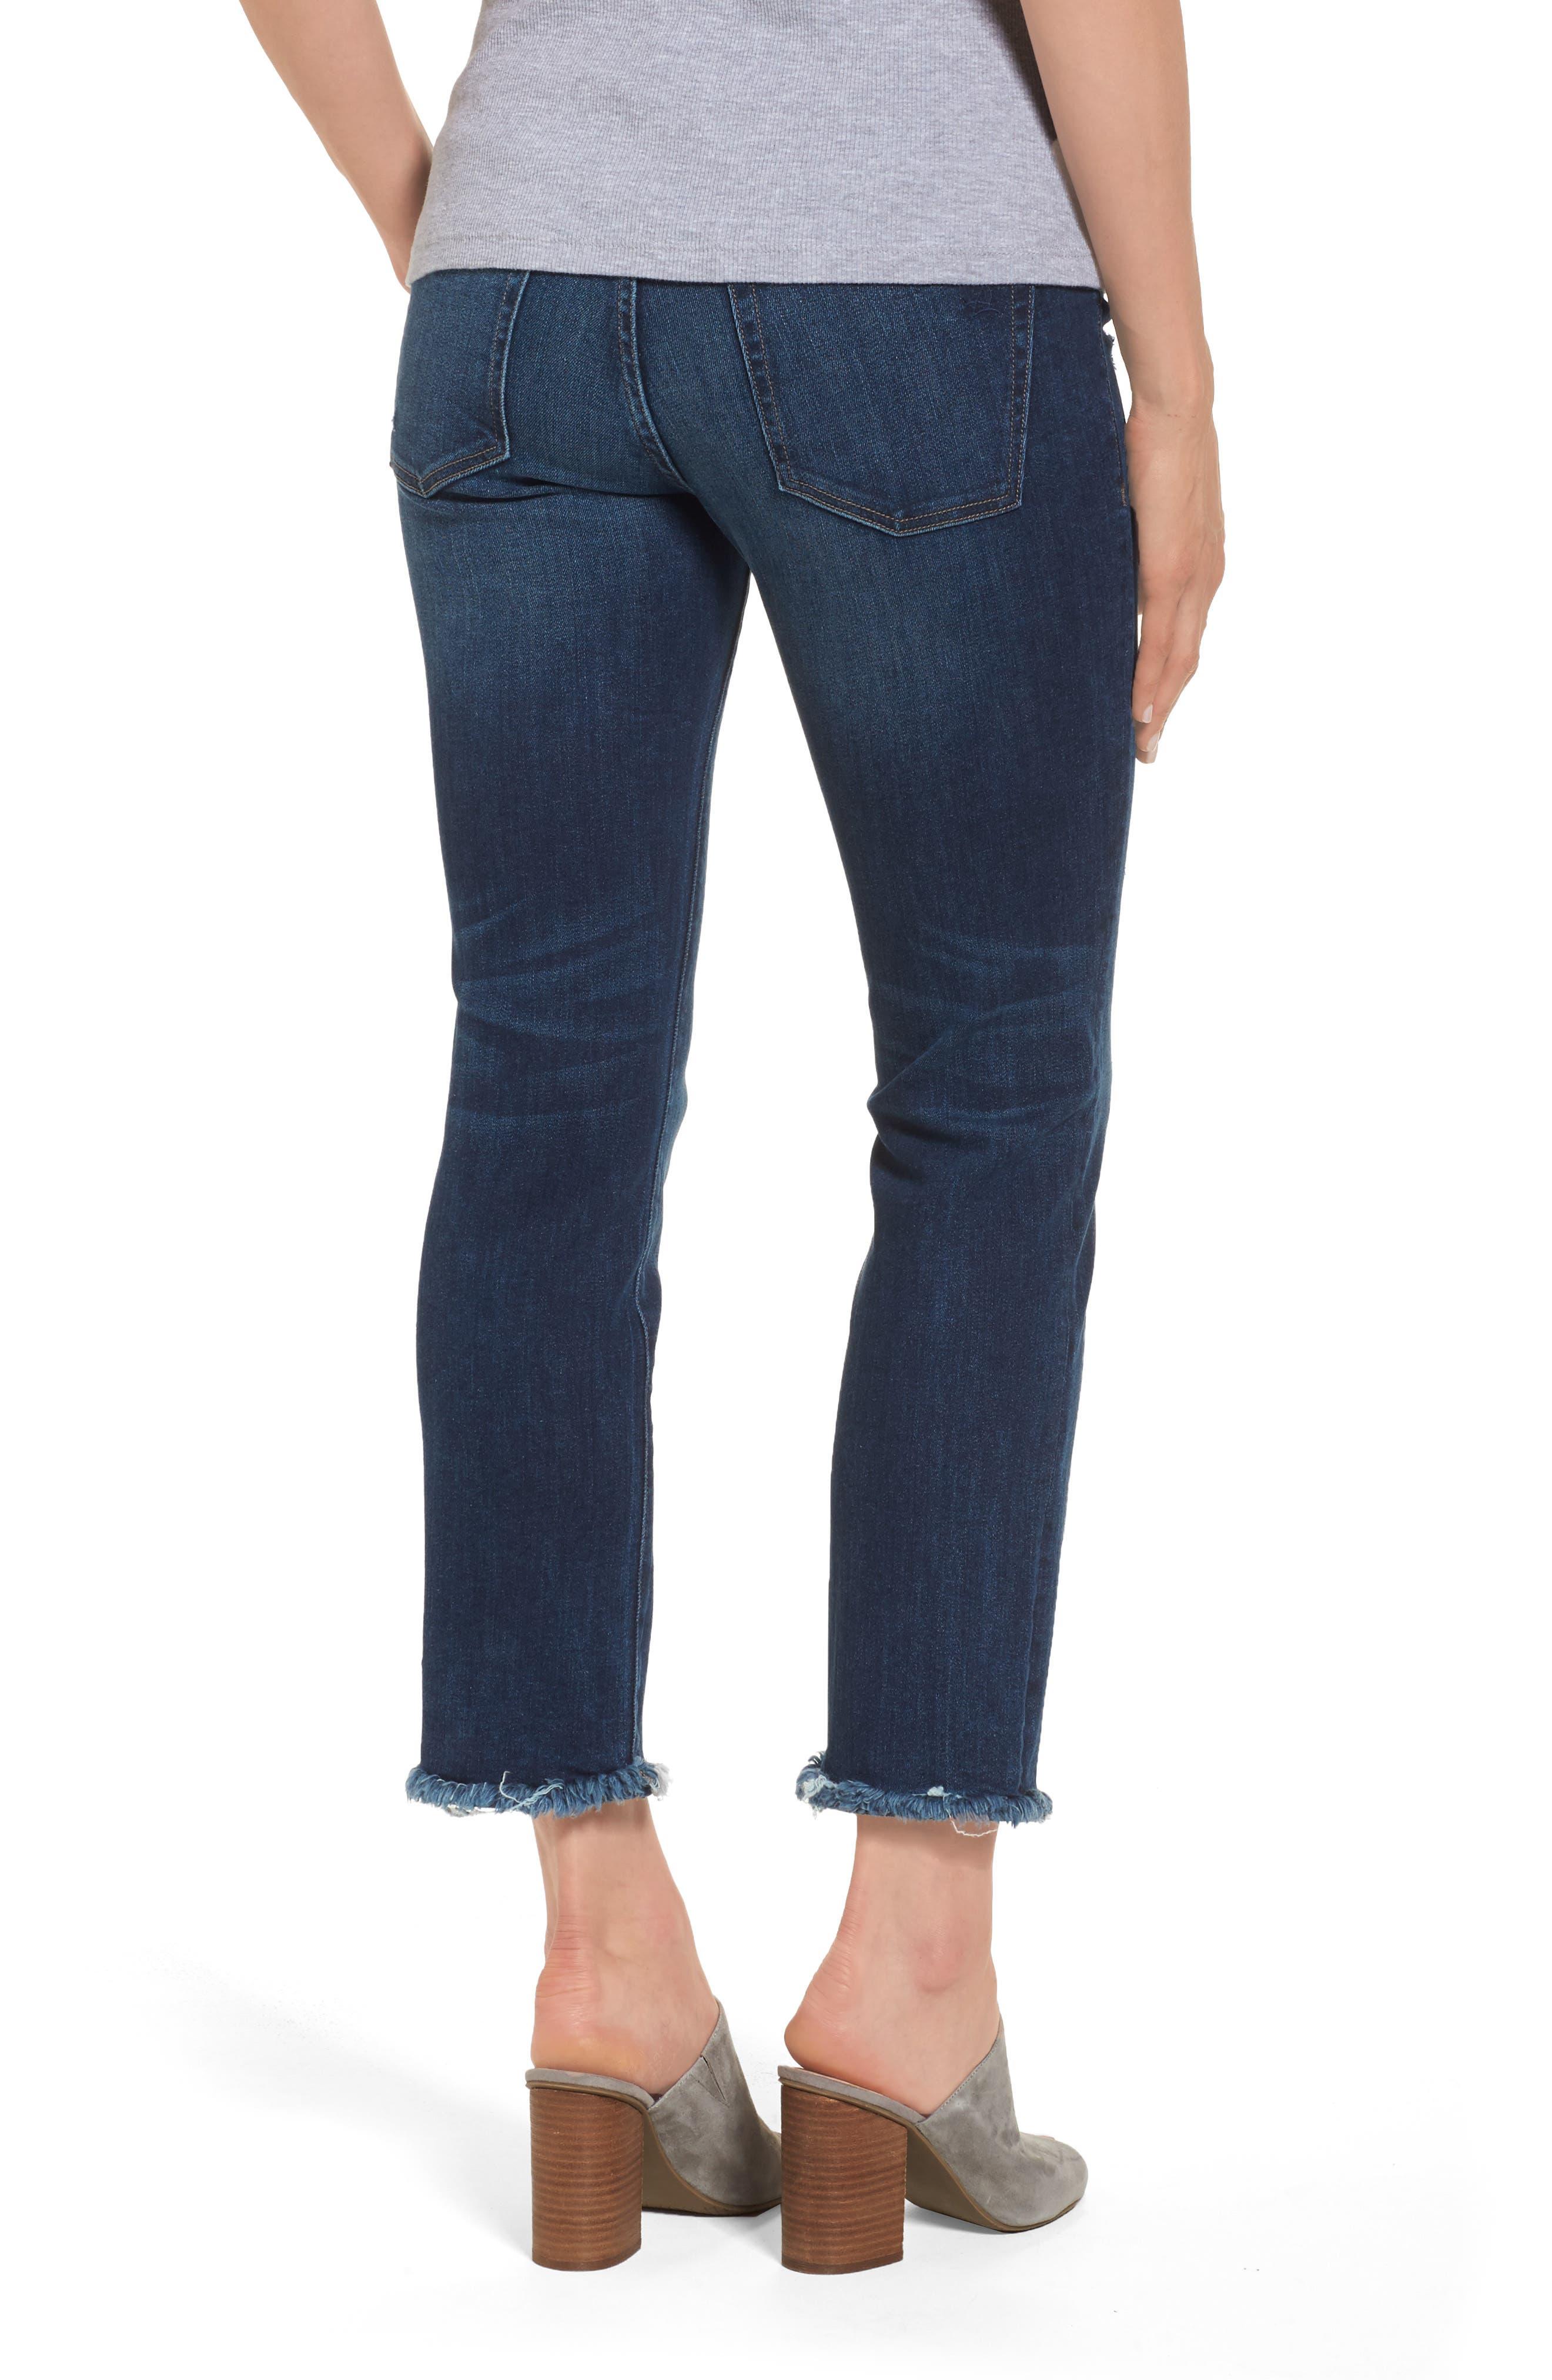 Mara Maternity Ankle Jeans,                             Alternate thumbnail 2, color,                             405